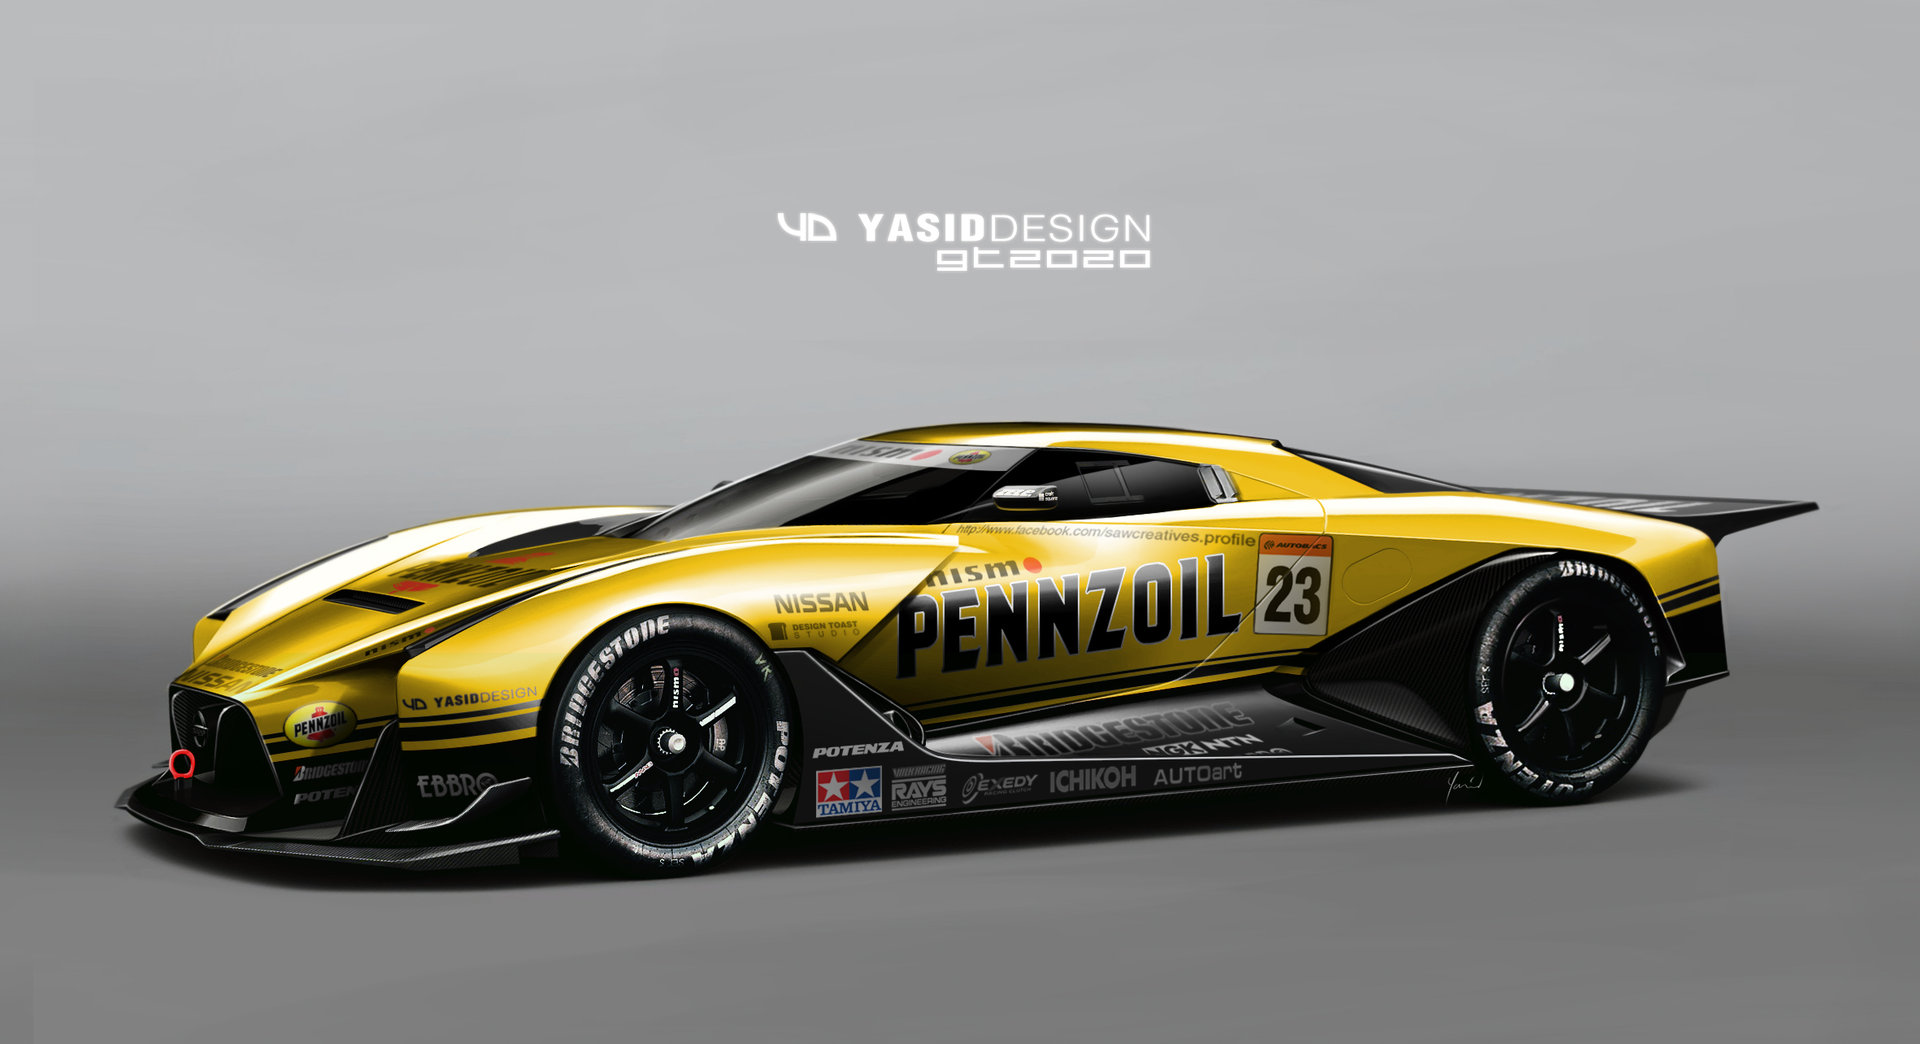 Yasid Oozeear Nissan Gt 2020 Pennzoil